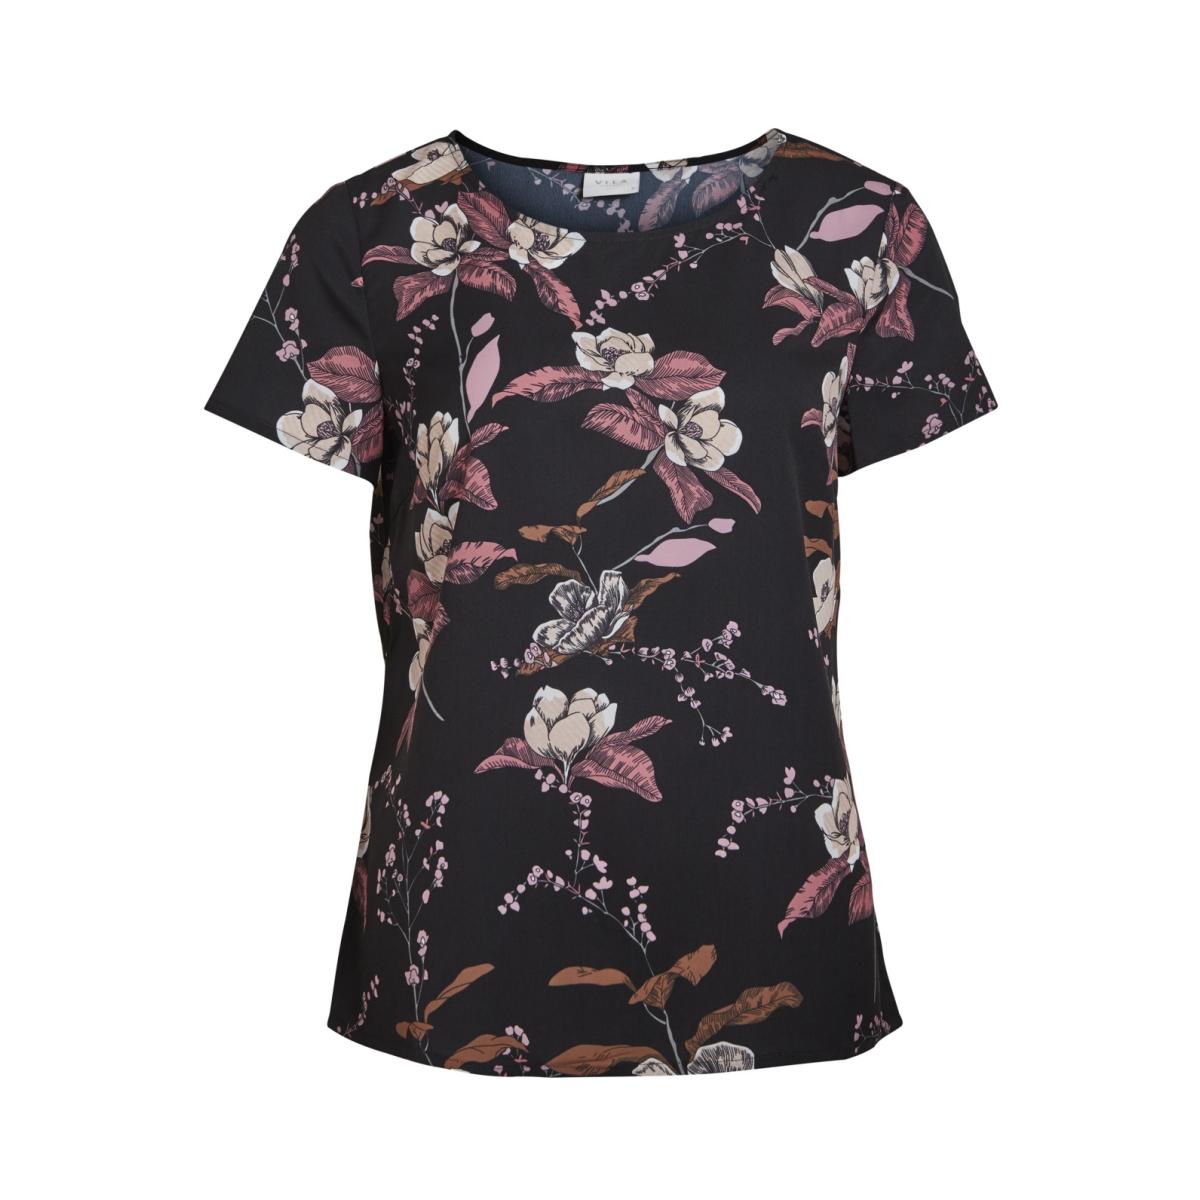 vipausina new s/s top /rx 14046862 vila t-shirt black/with print